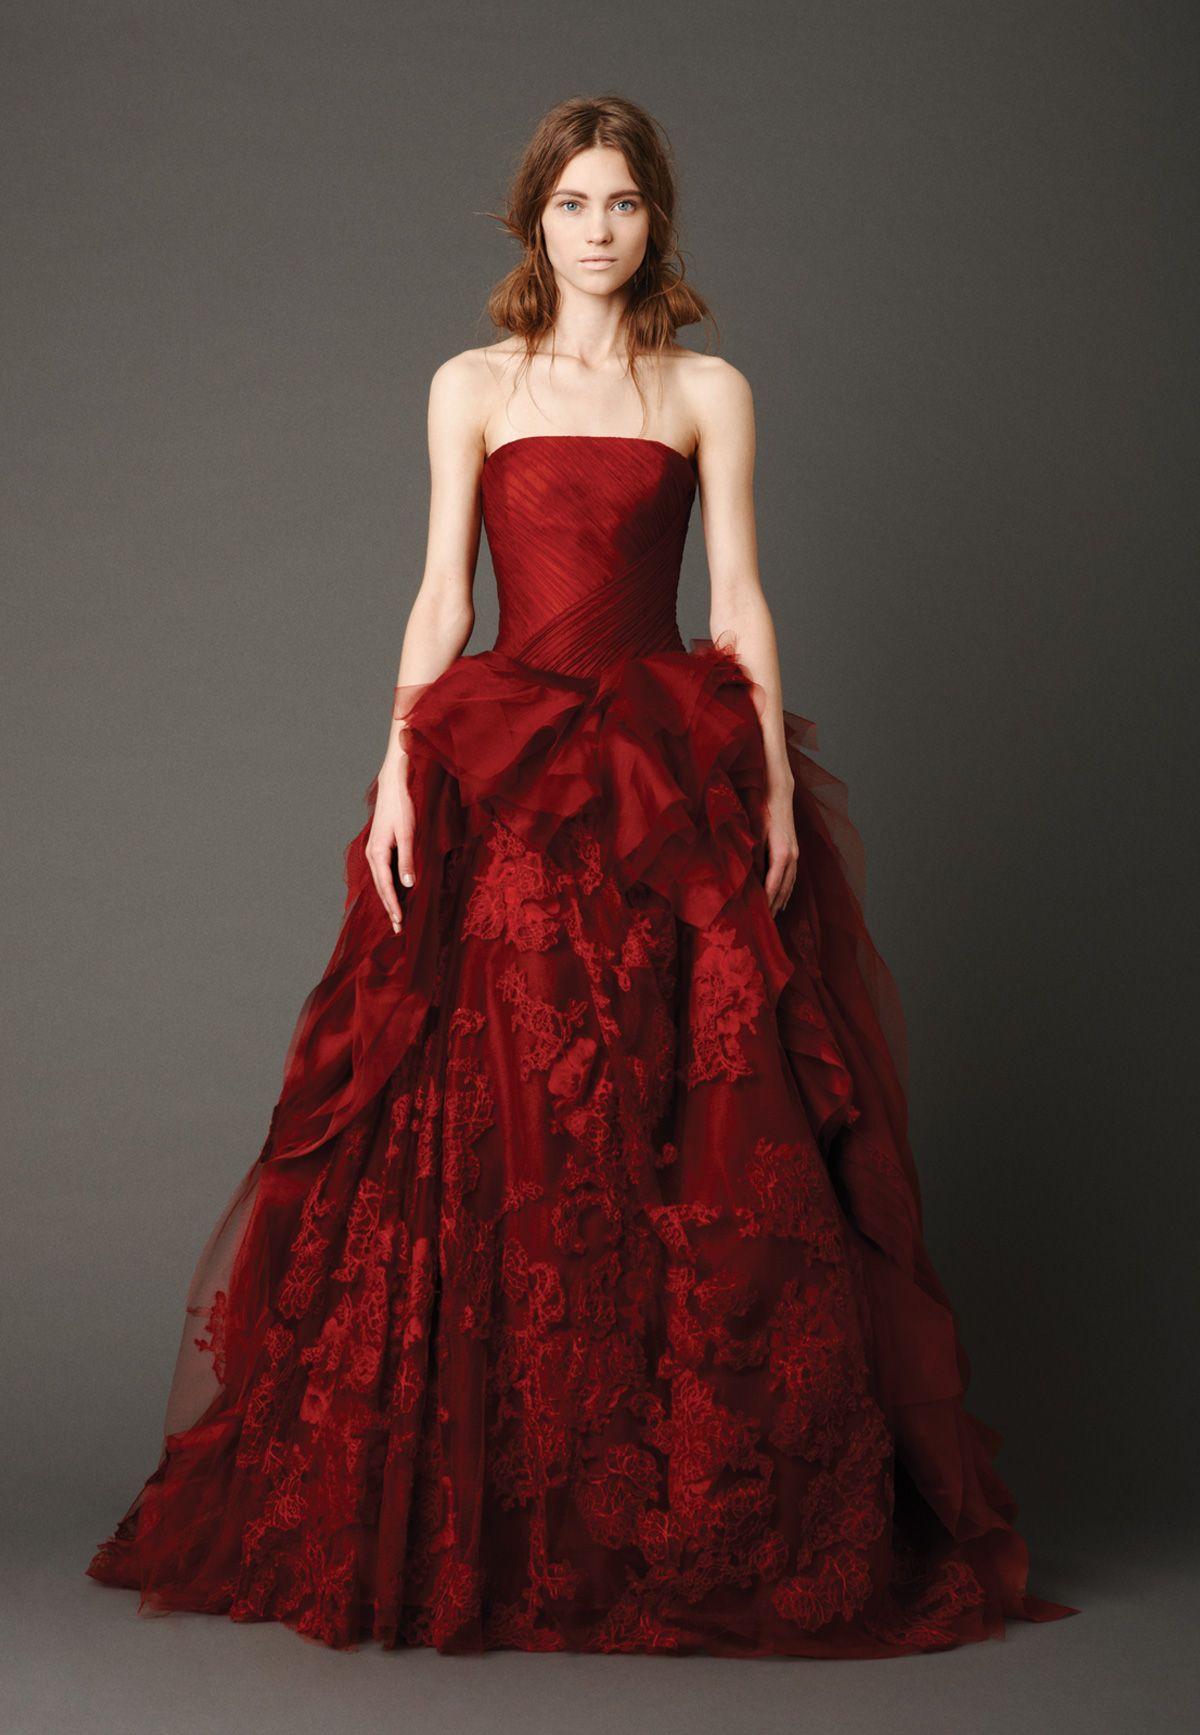 Inspirational Wedding Dresses In Color